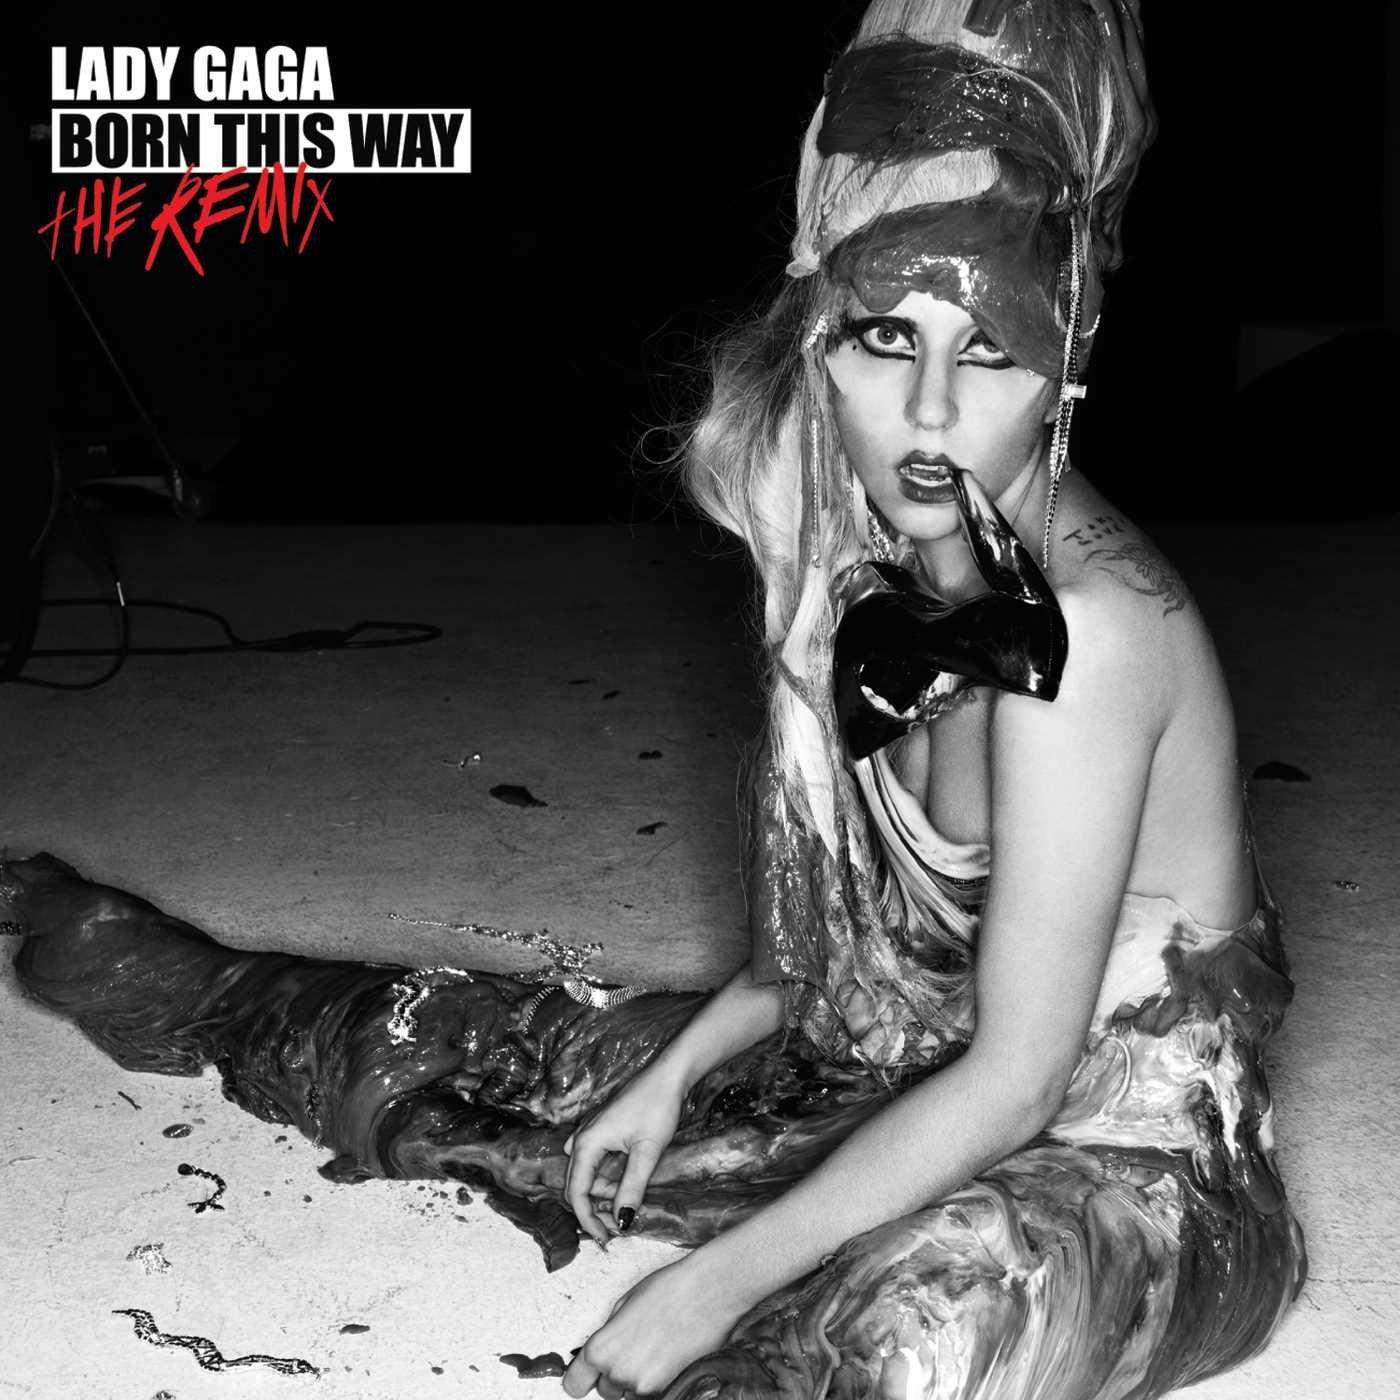 Lady Gaga, Born This Way: The Remix